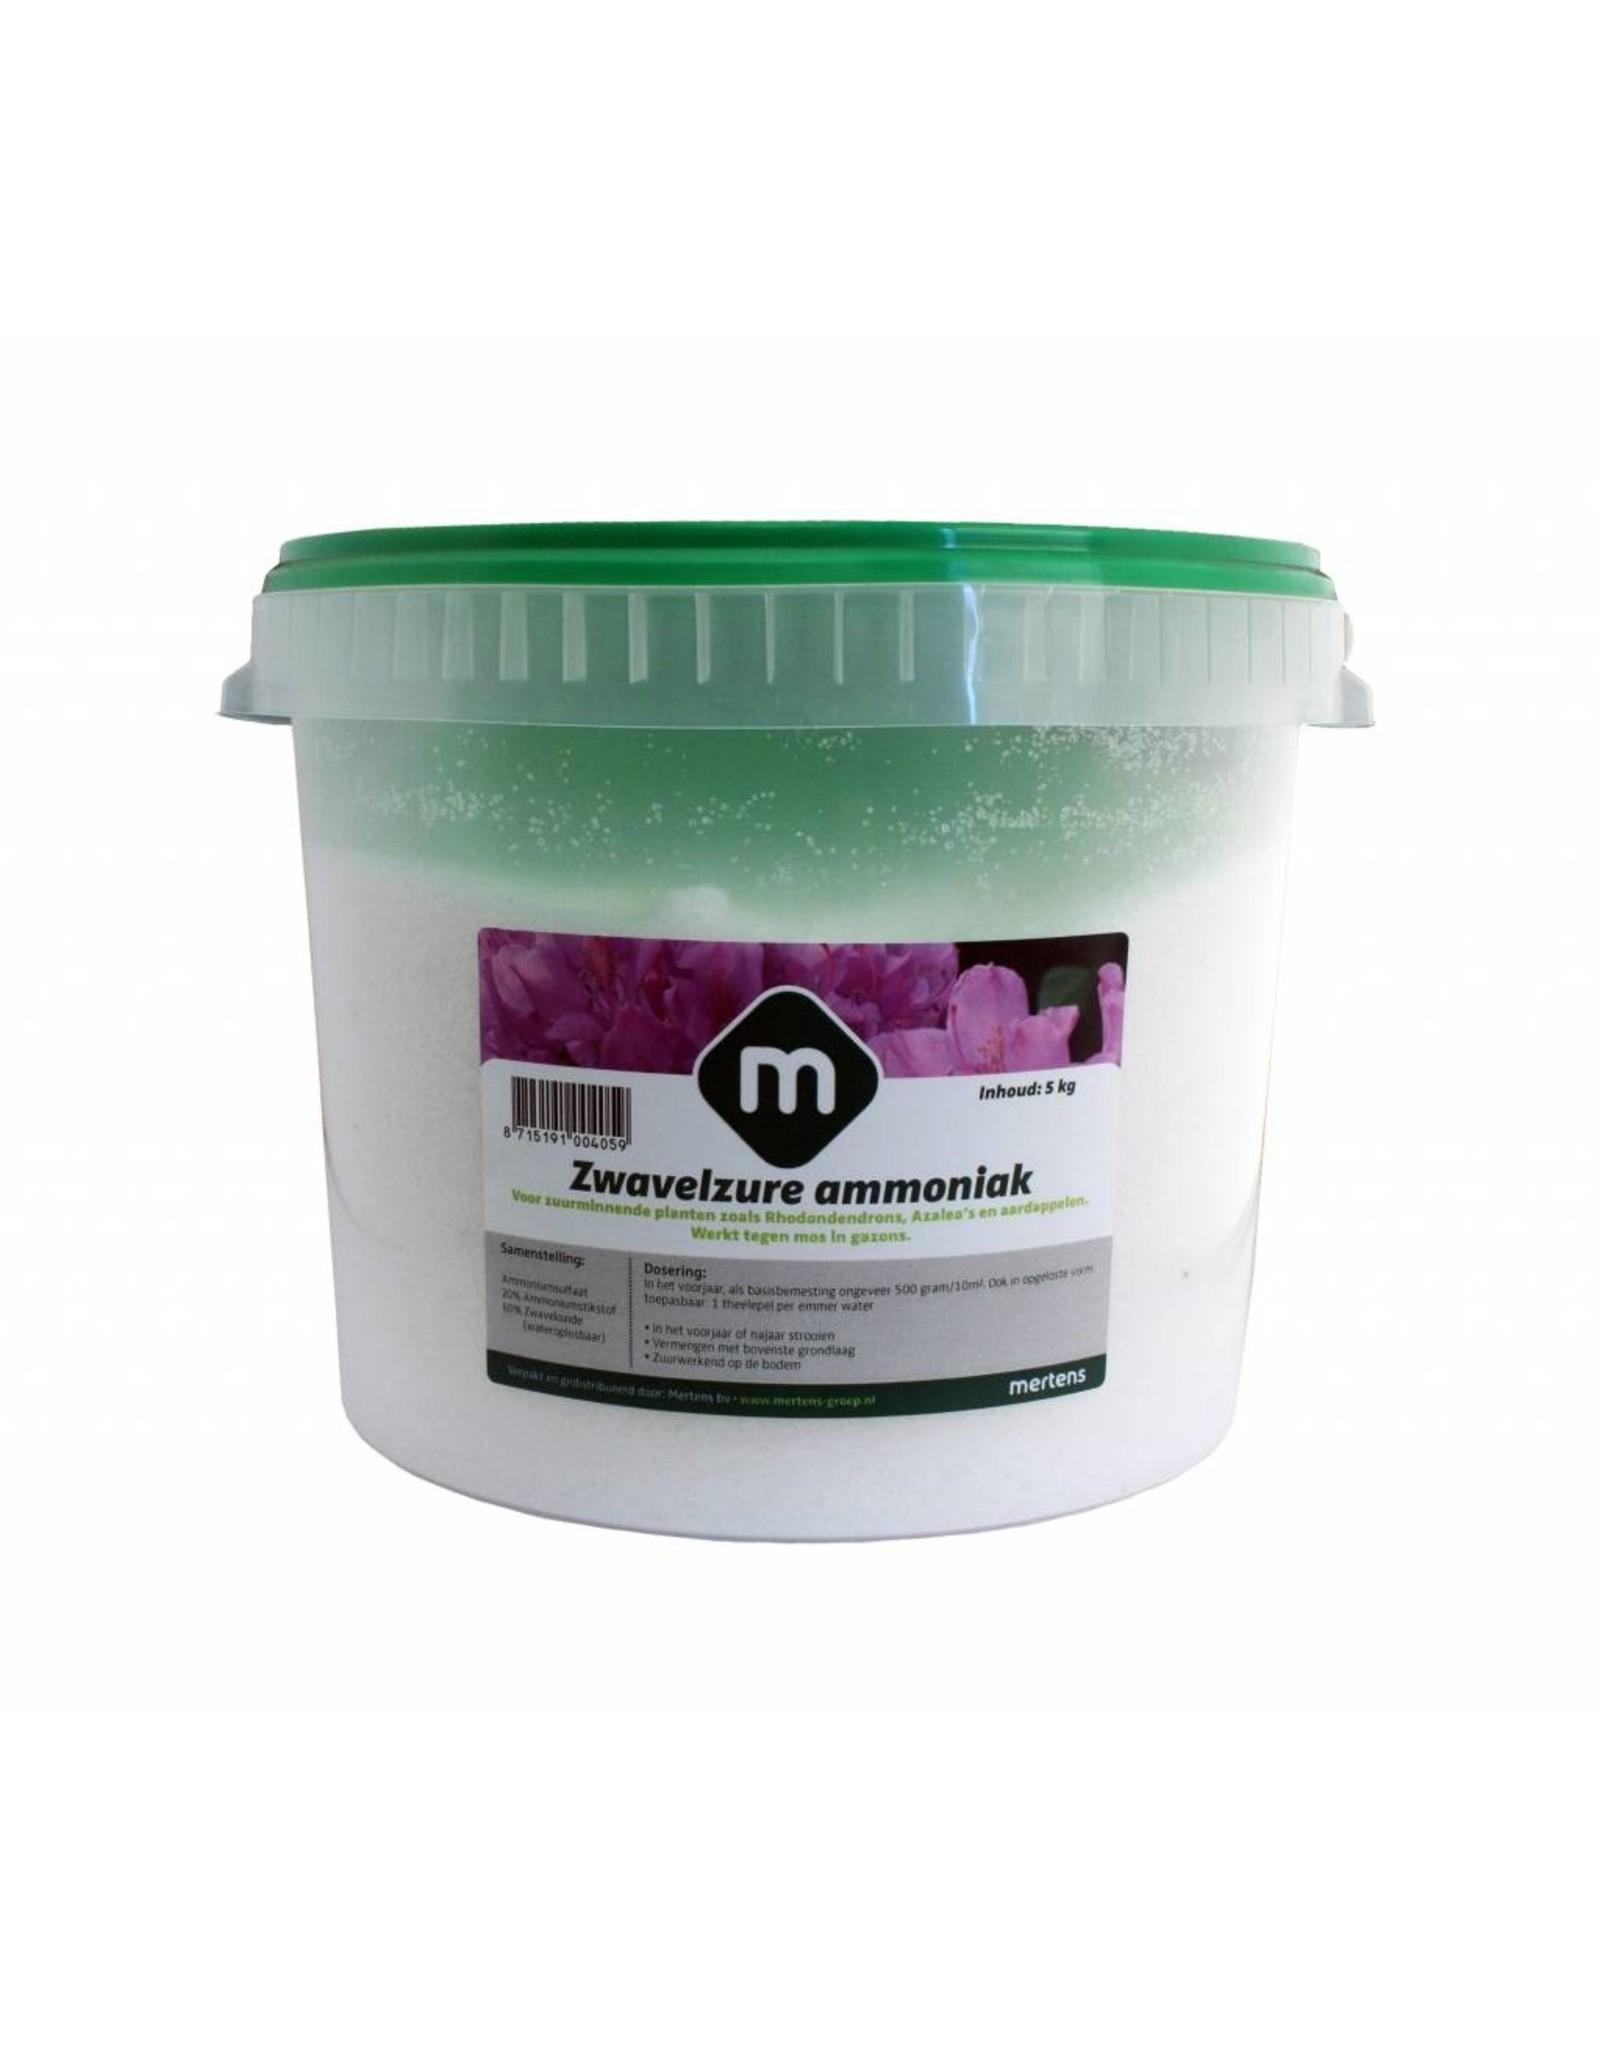 Mertens Zwavelzure ammoniak 5 kg